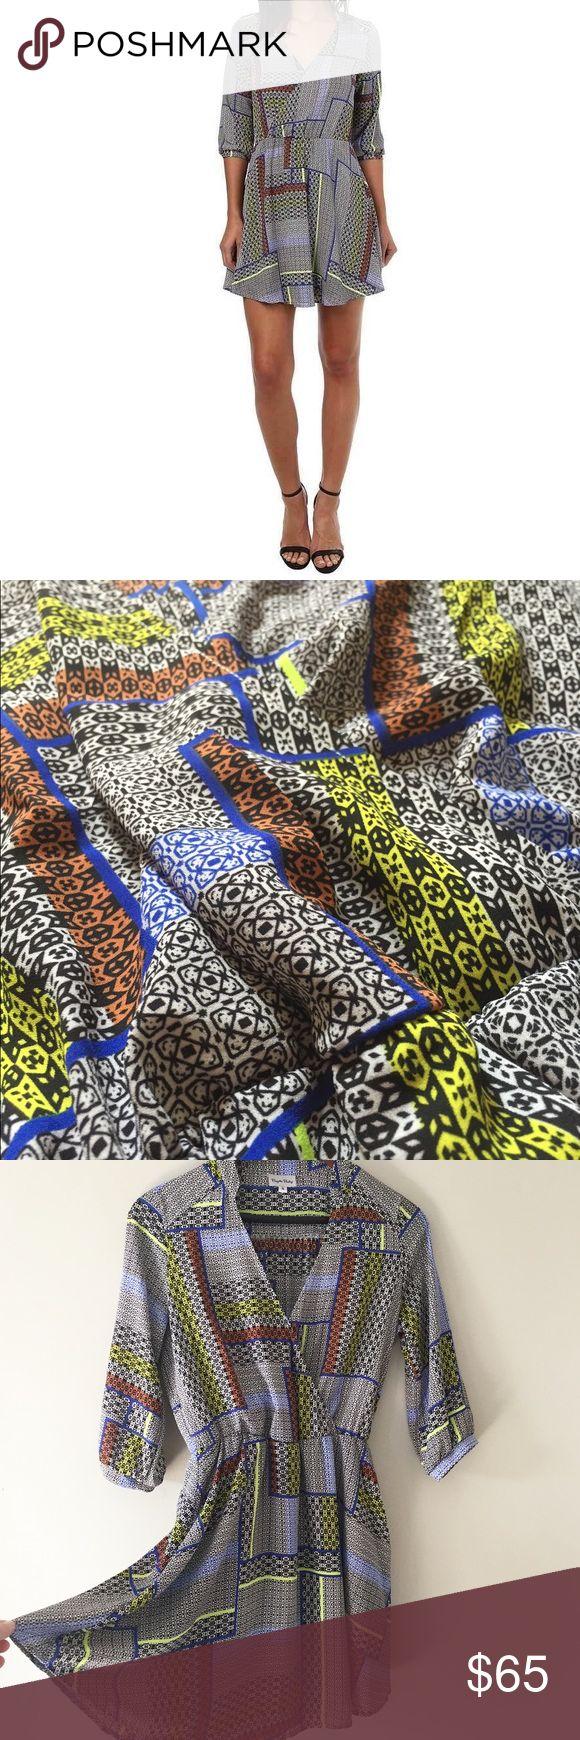 ✨JUST IN! NWOT Bridgitte Bailey Austen Dress Brigitte Bailey Austen Dress in Neon Multi ✨✨✨   💗Brand new, no tags  💗Size S 💗Reasonable offers welcome! Brigitte Bailey Dresses Mini